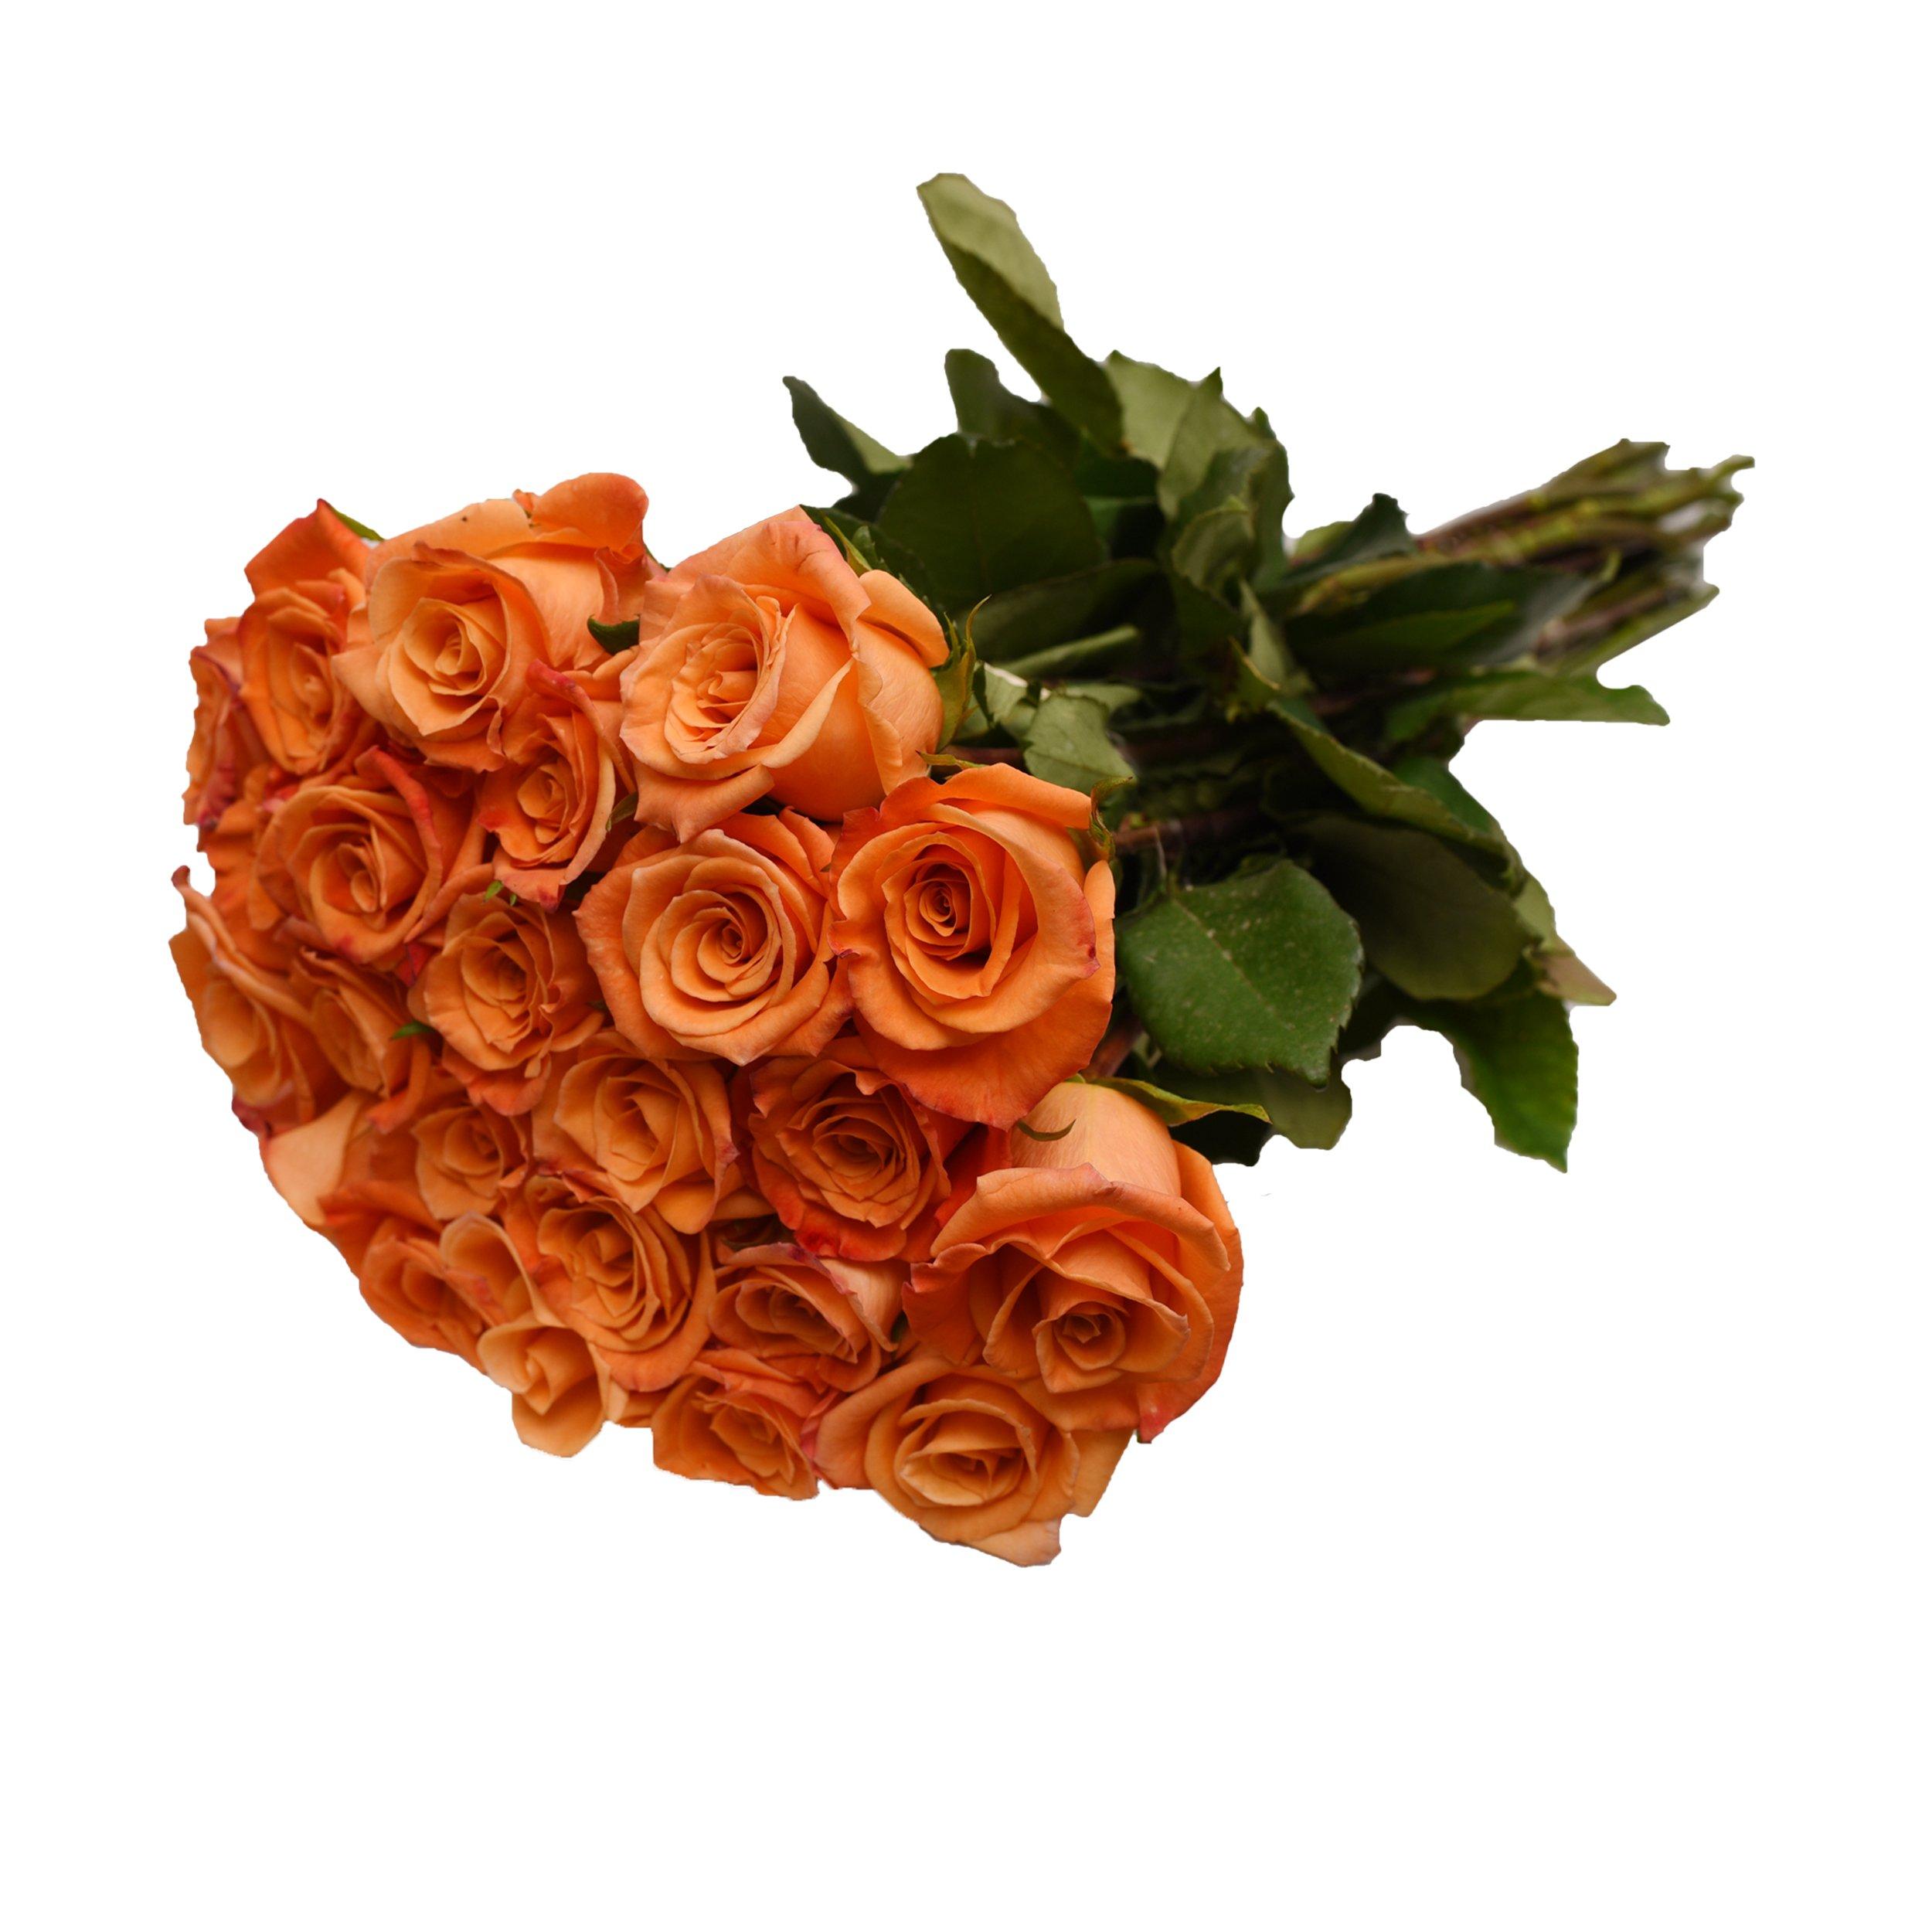 Farm Fresh Natural Orange Roses - 16 in - 125 stems